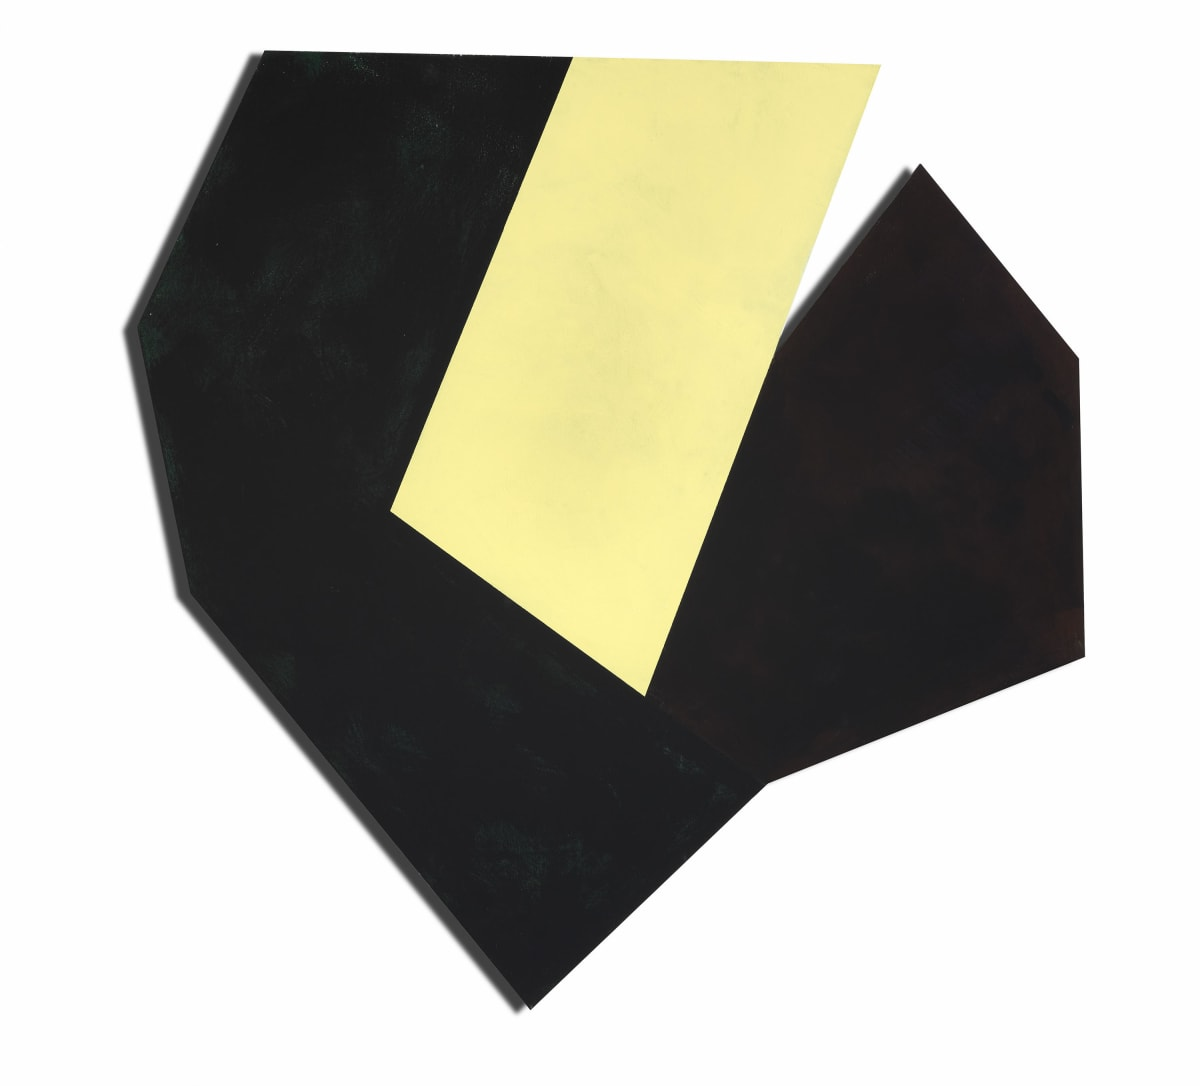 Ric Evans, Cardinal Elements (Yellow), 2019